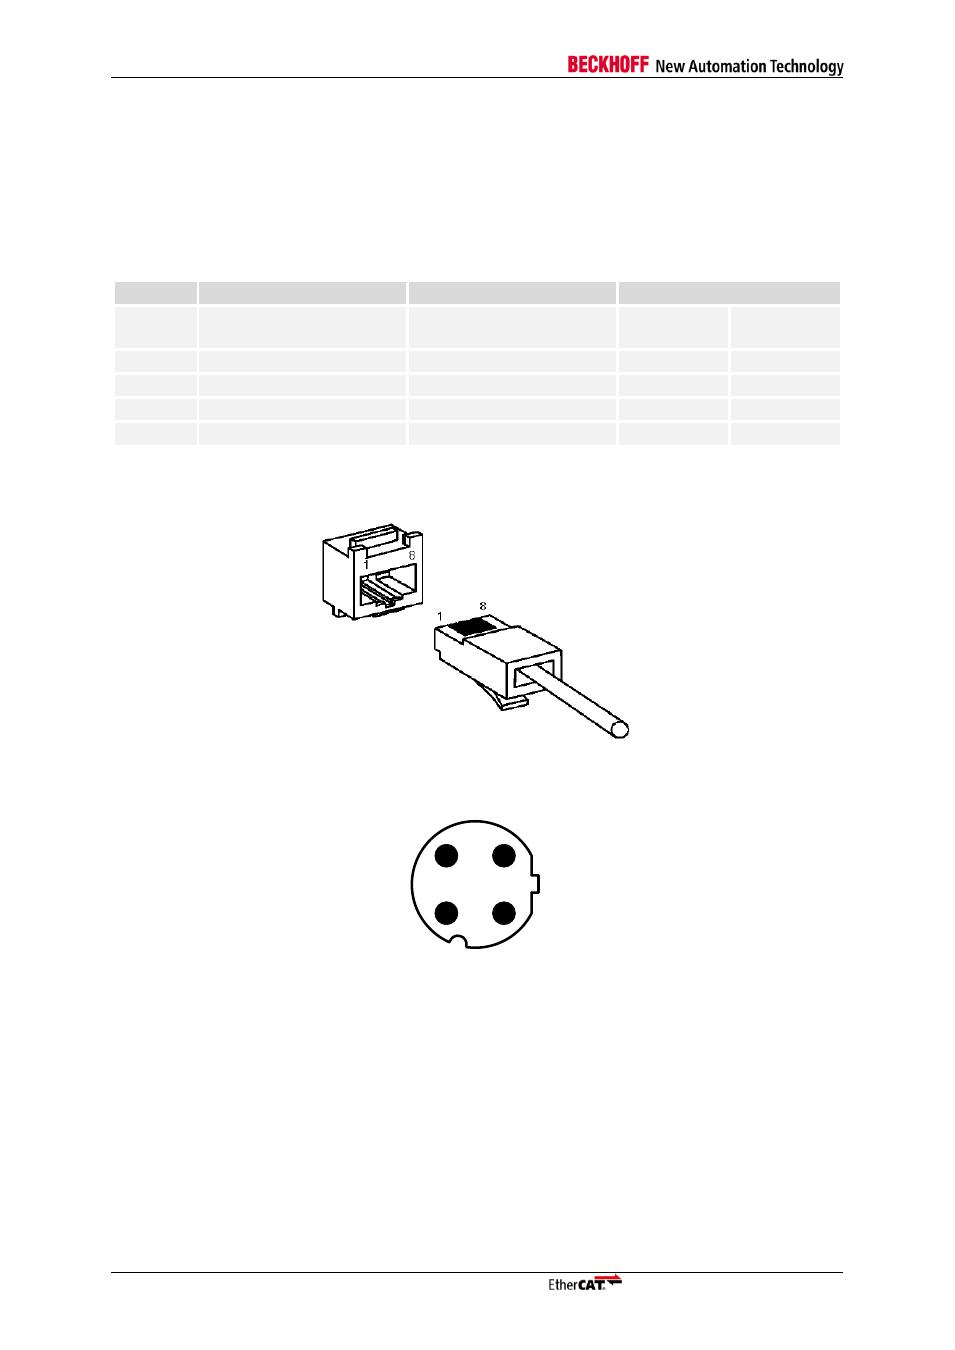 13 ethernet connector (rj45 / m12), Ethernet connector (rj45 / m12